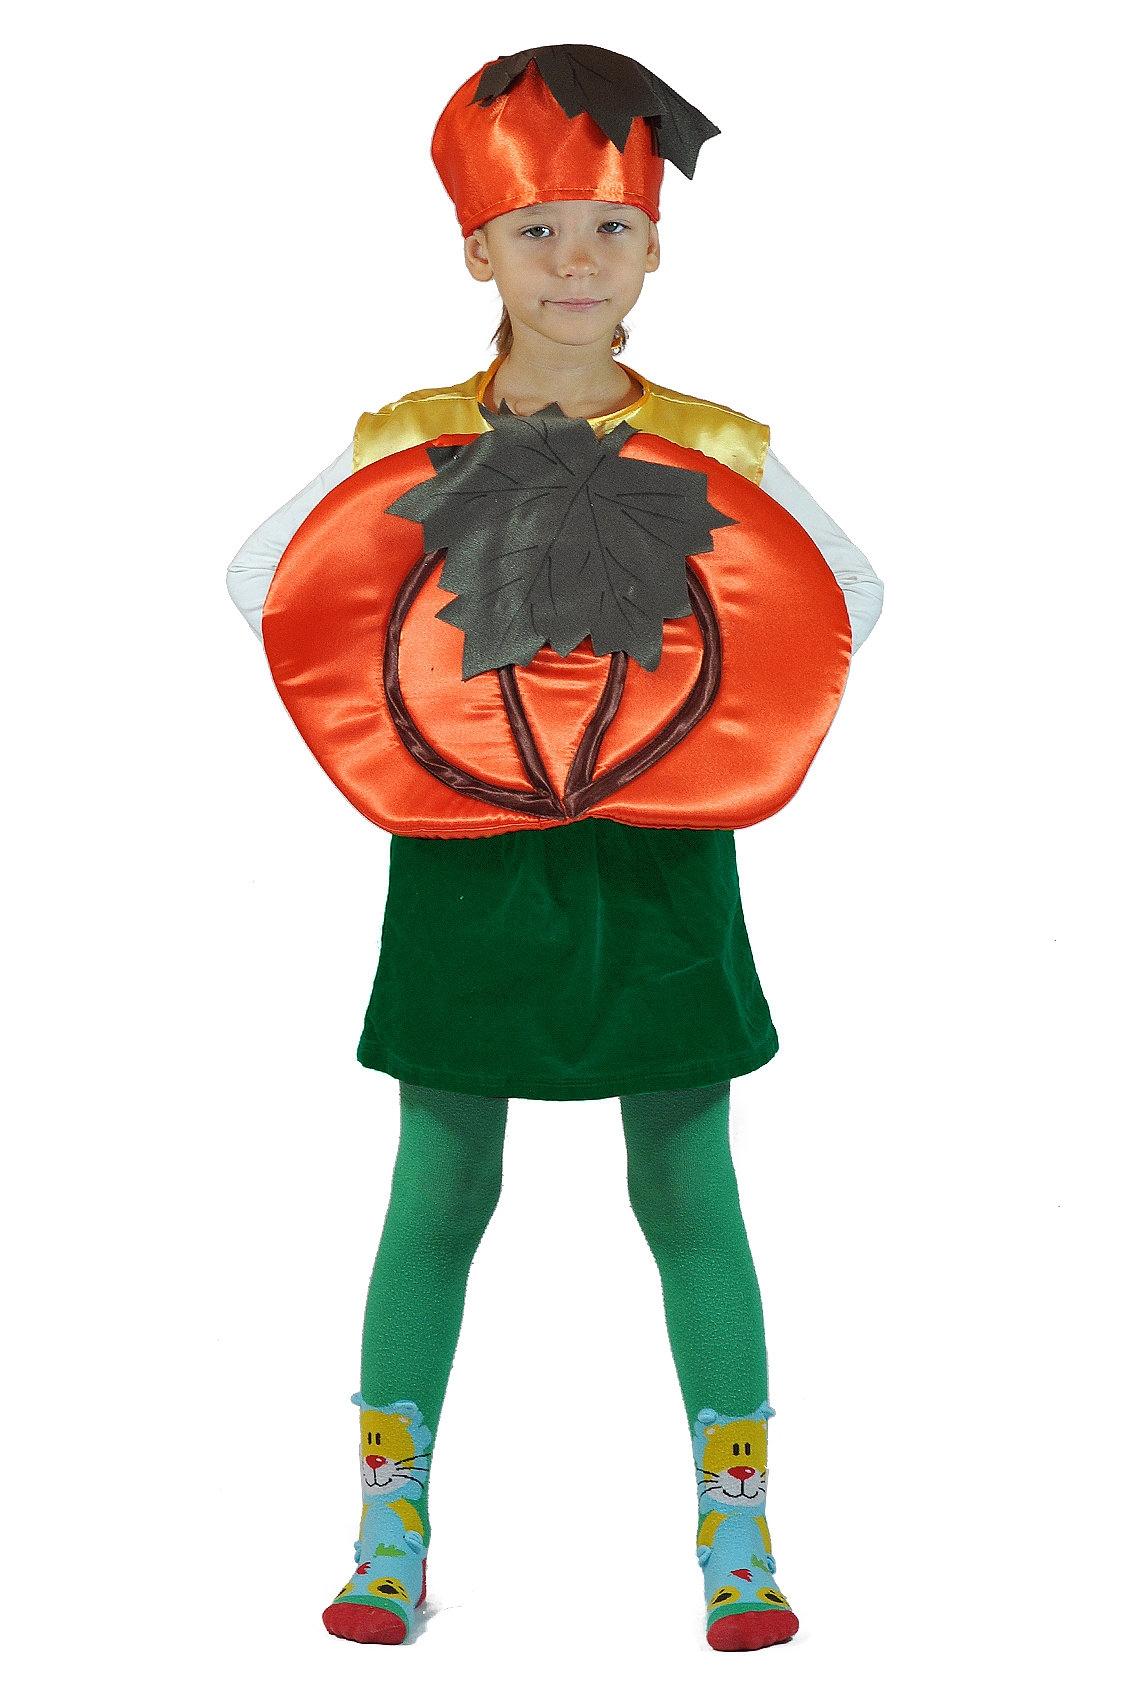 Детский костюм Огородной Тыквы (26-34) детский костюм фиолетовой феи виндс 34